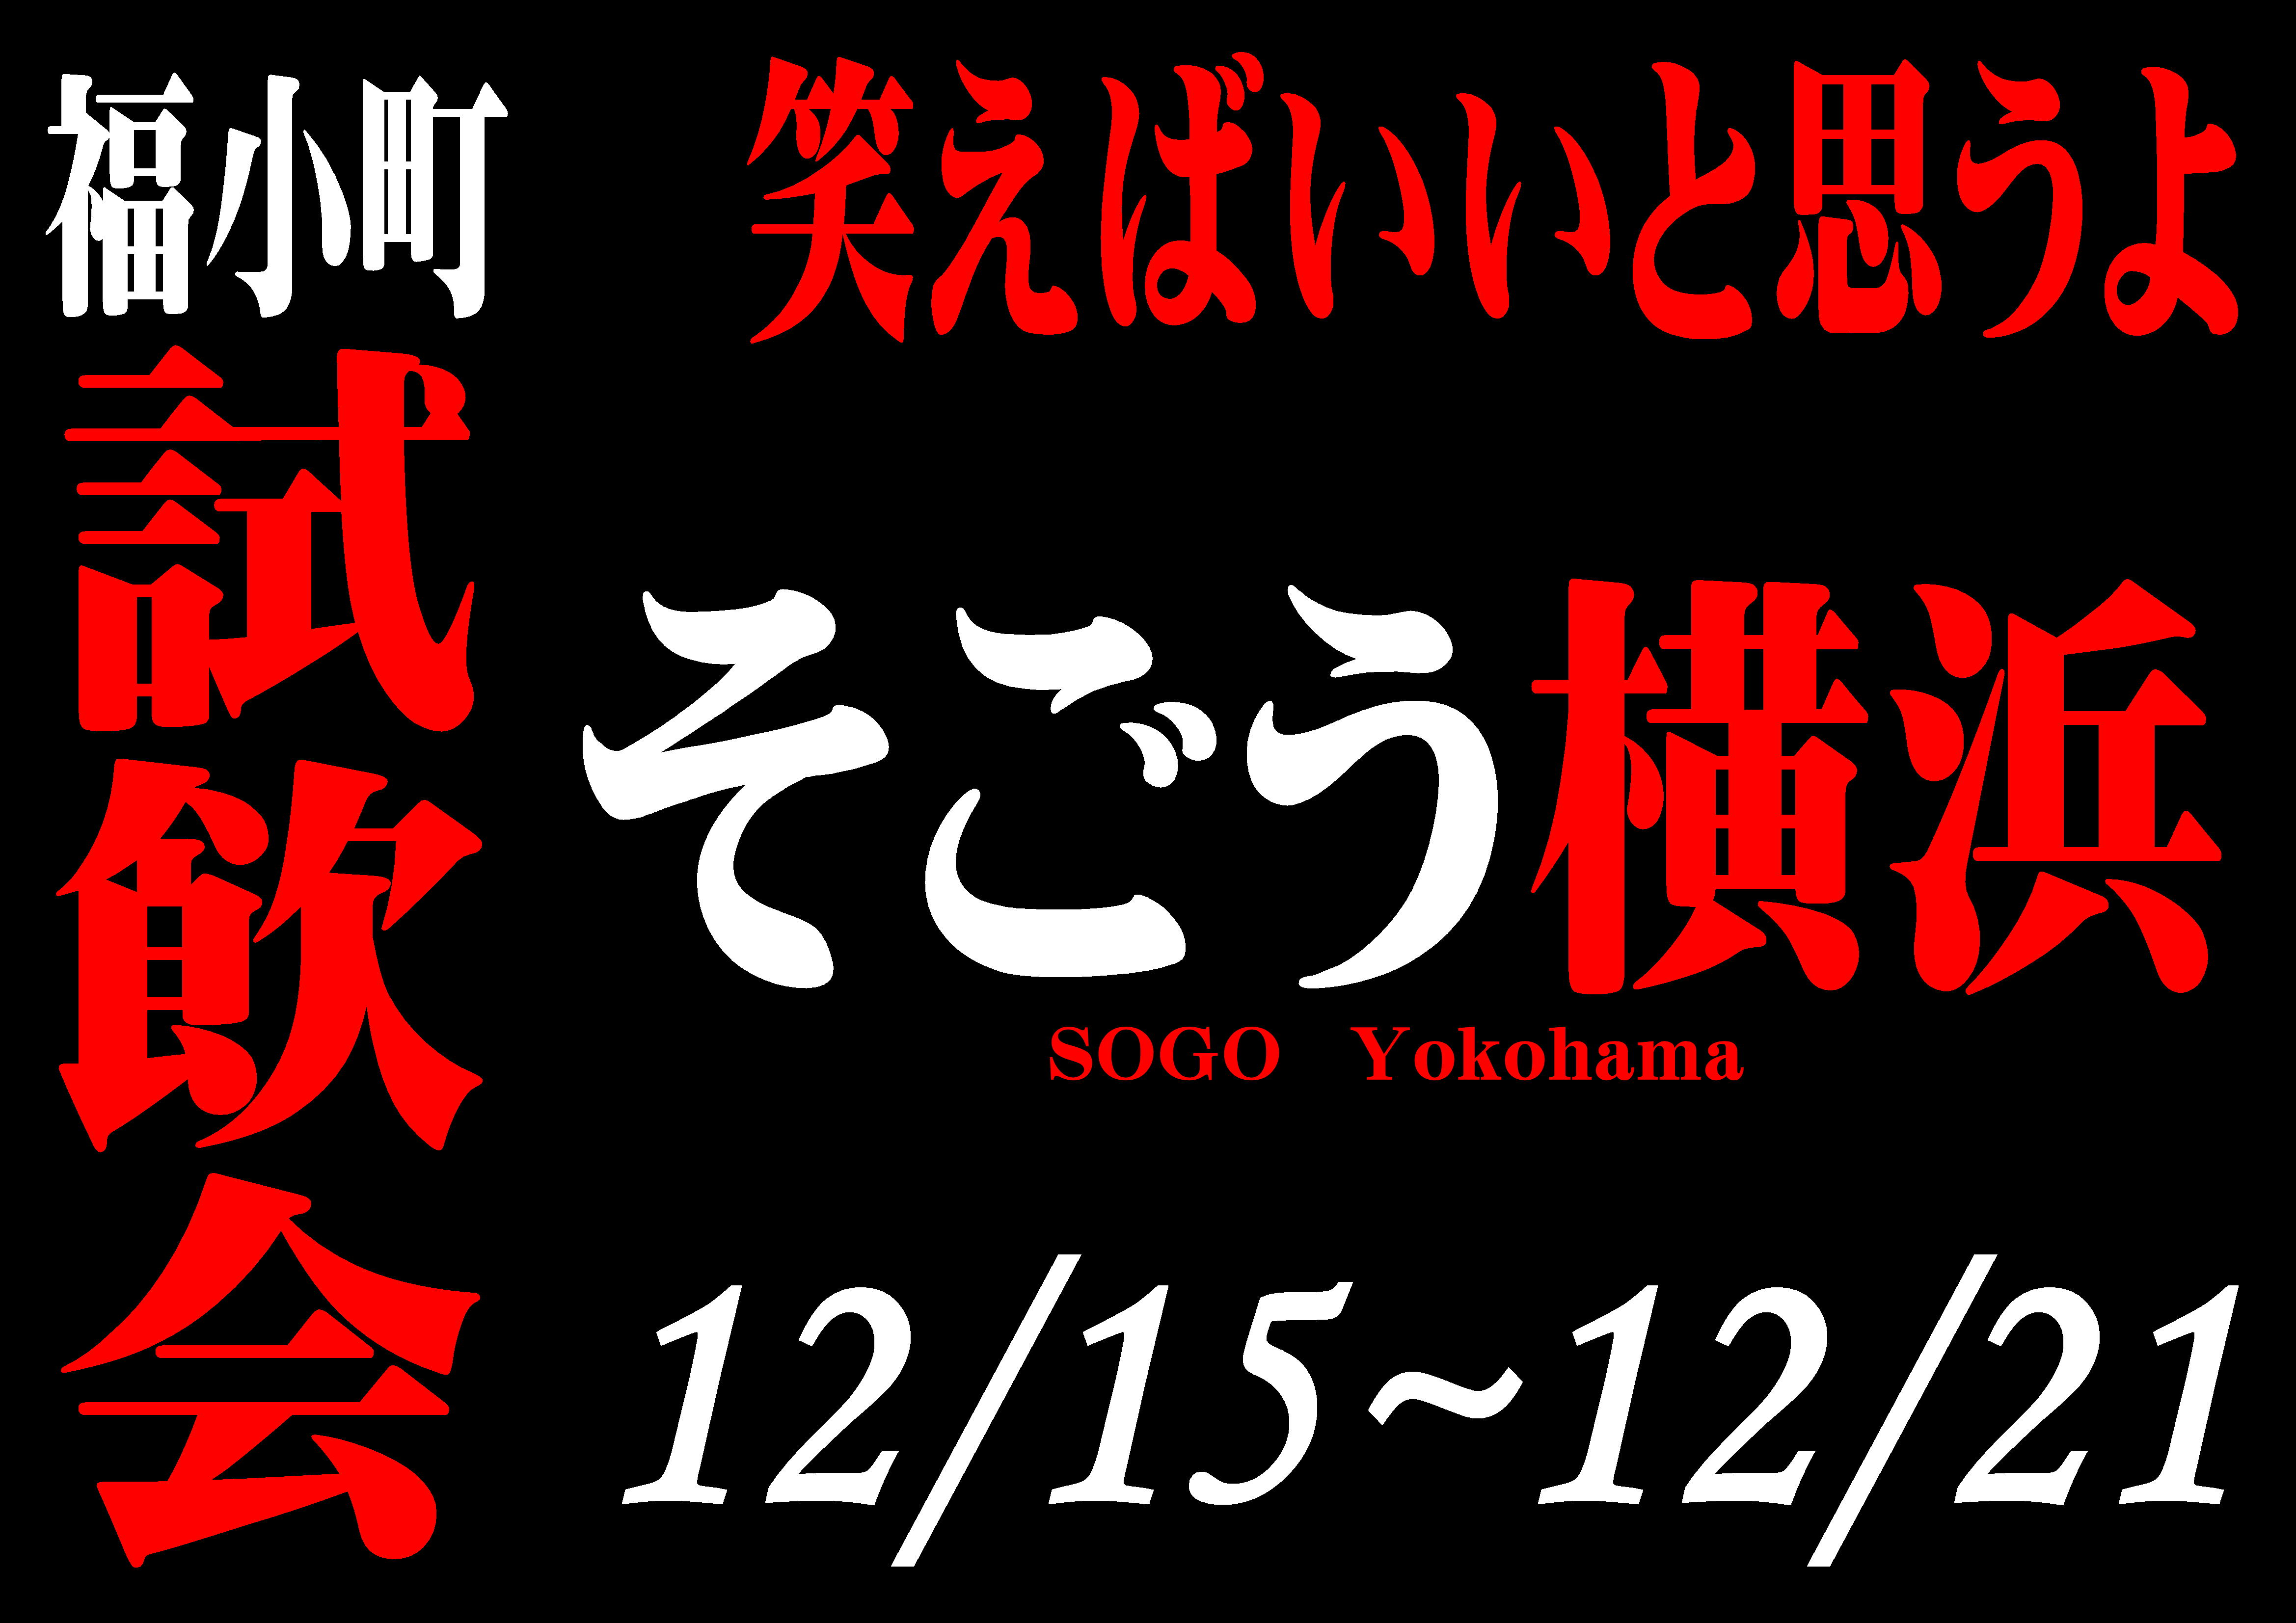 http://www.fukukomachi.com/blog/photo/20201217.JPG